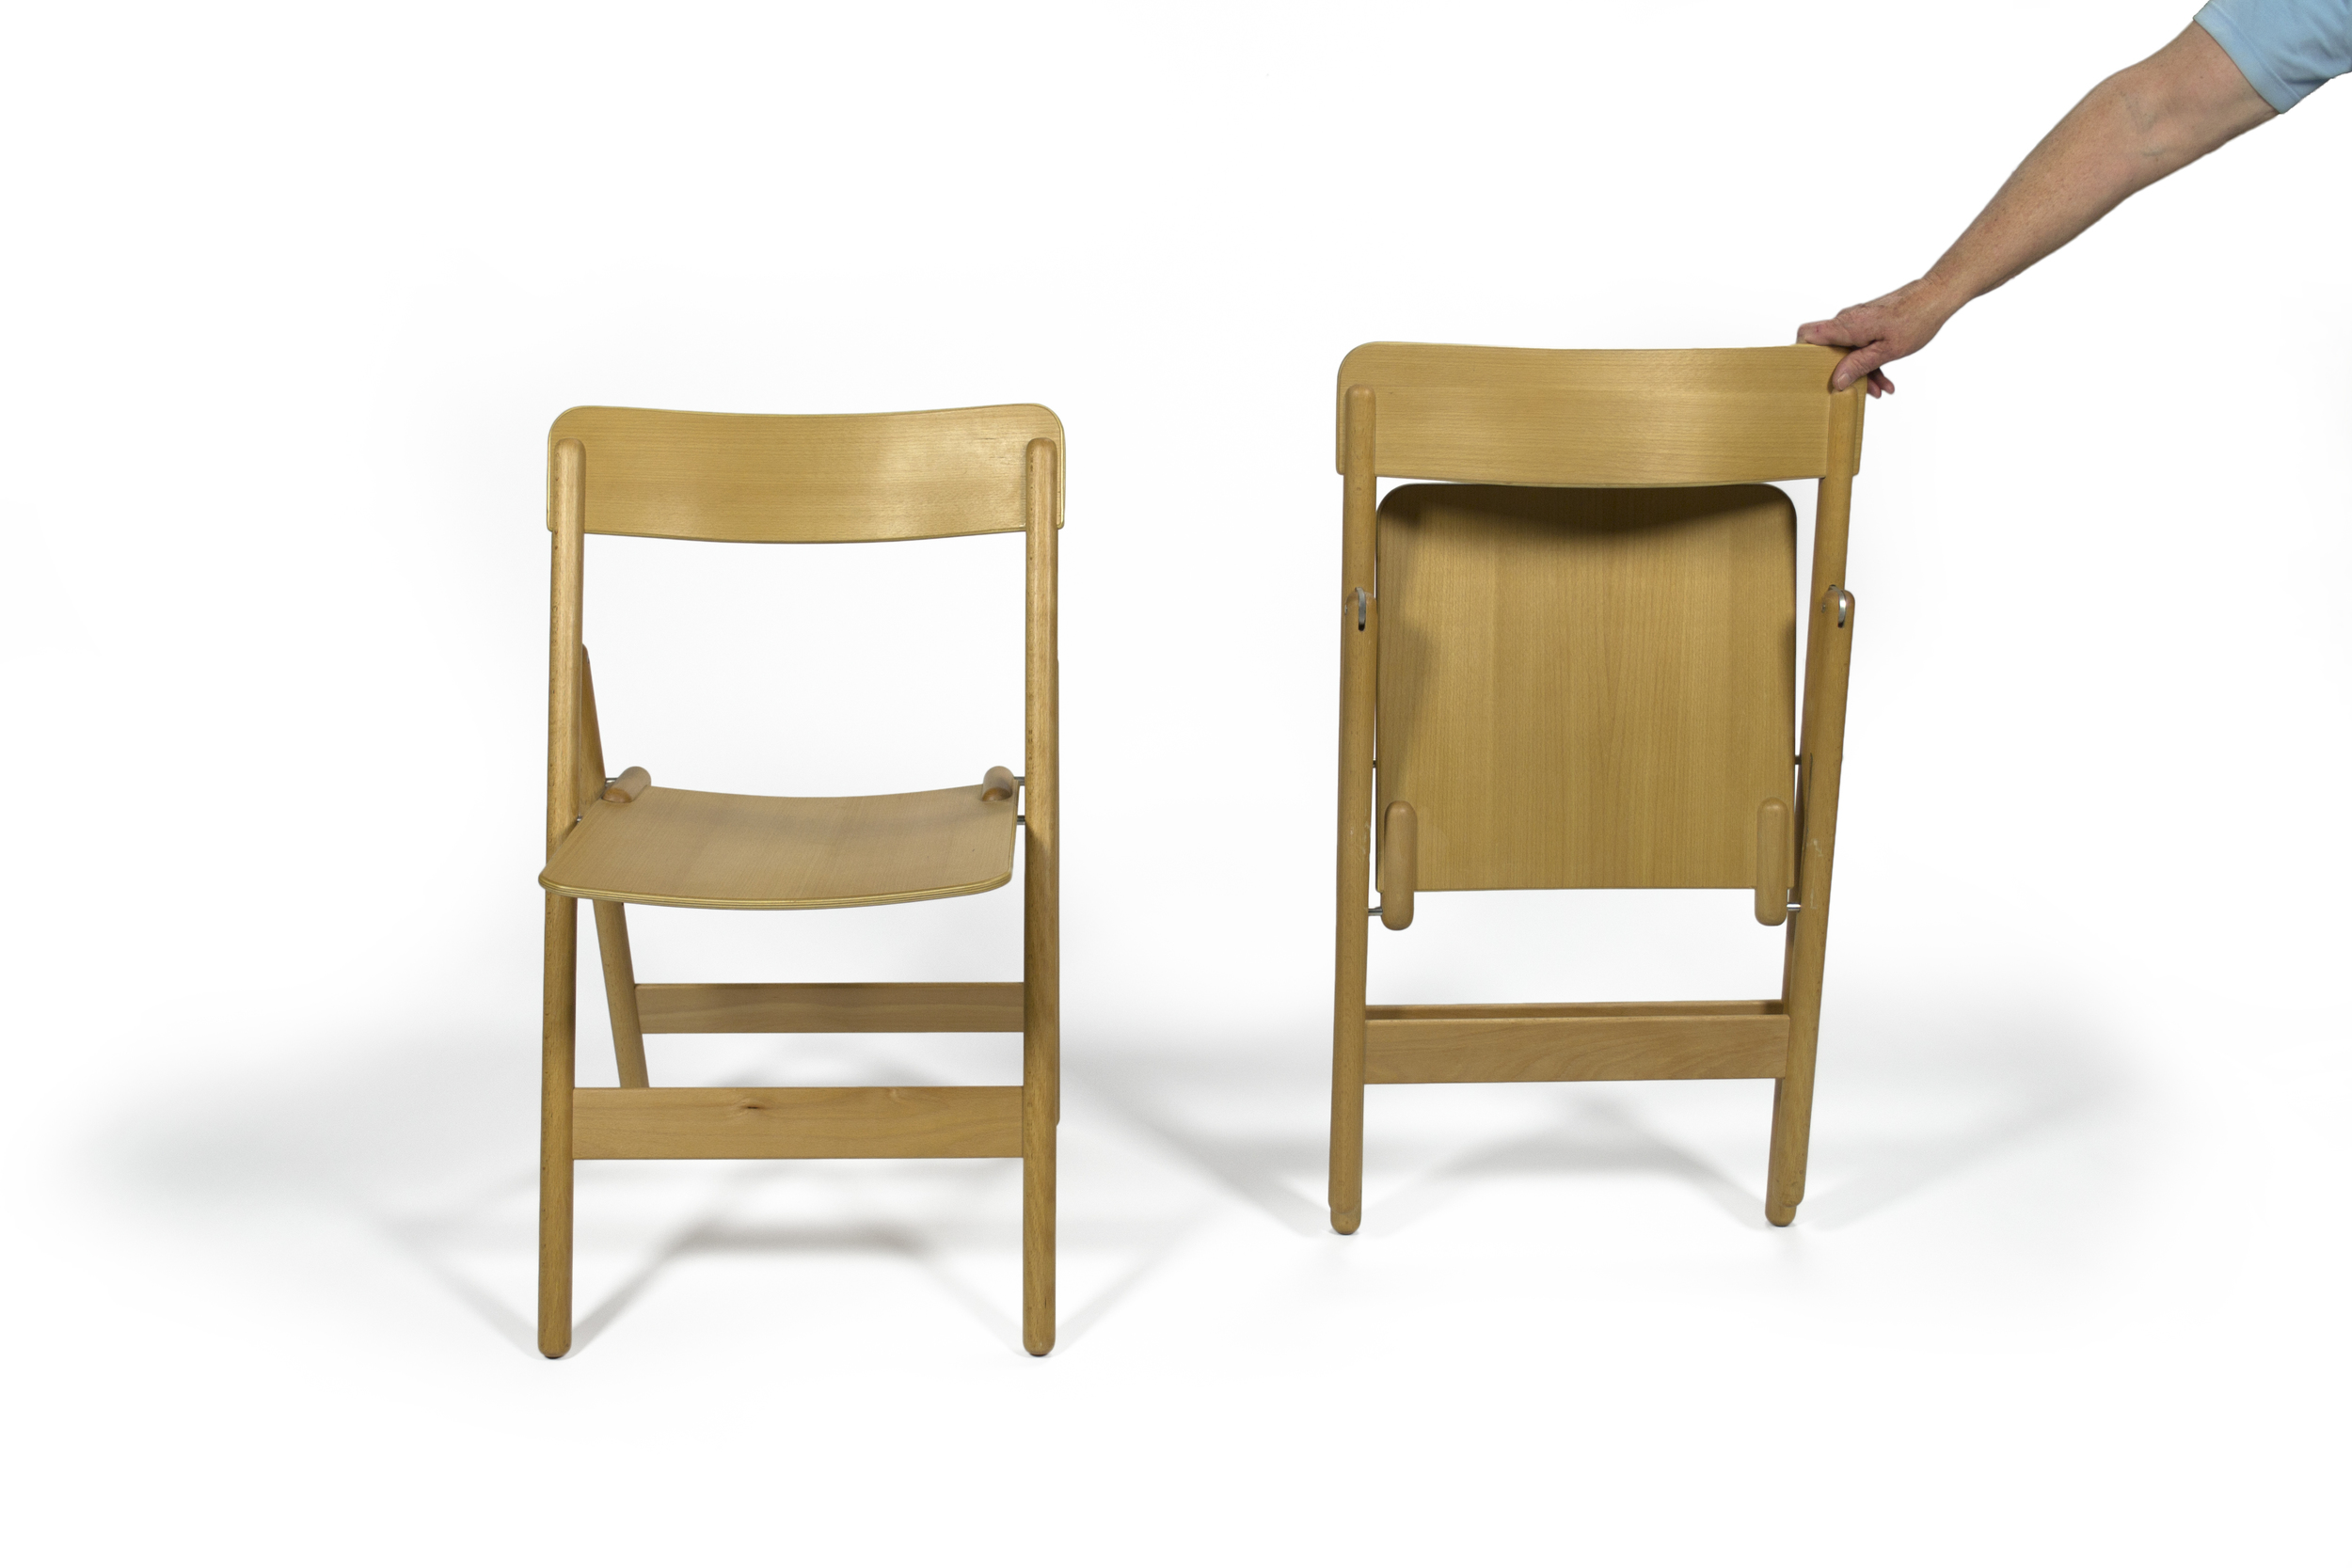 foldingchairs_onefolded_forward.jpg